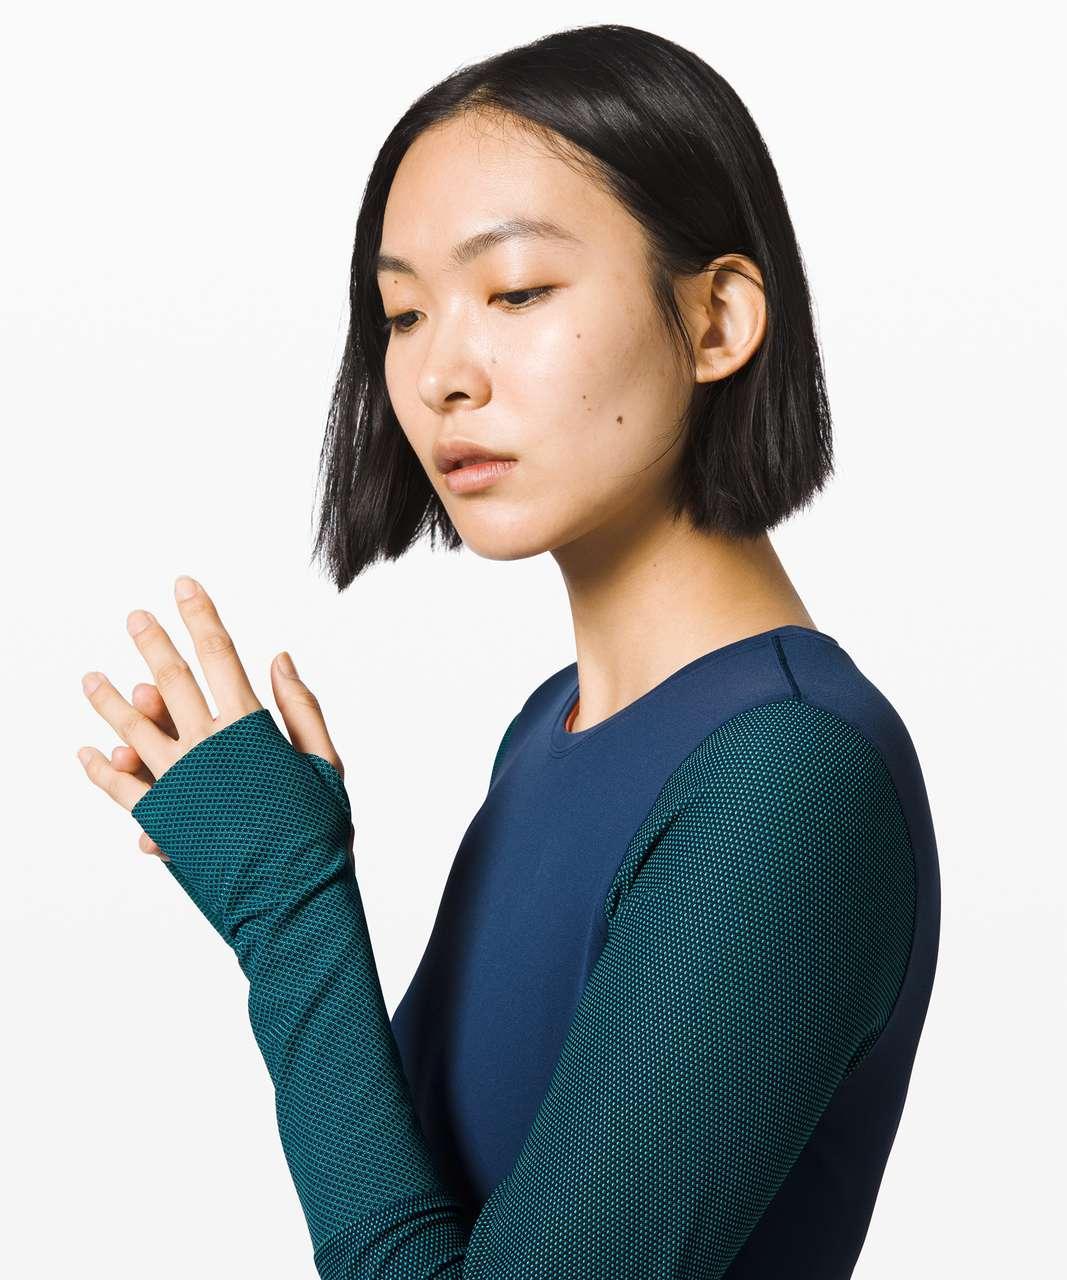 Lululemon My Element Long Sleeve *lululemon x Roksanda - True Navy / Arctic Teal